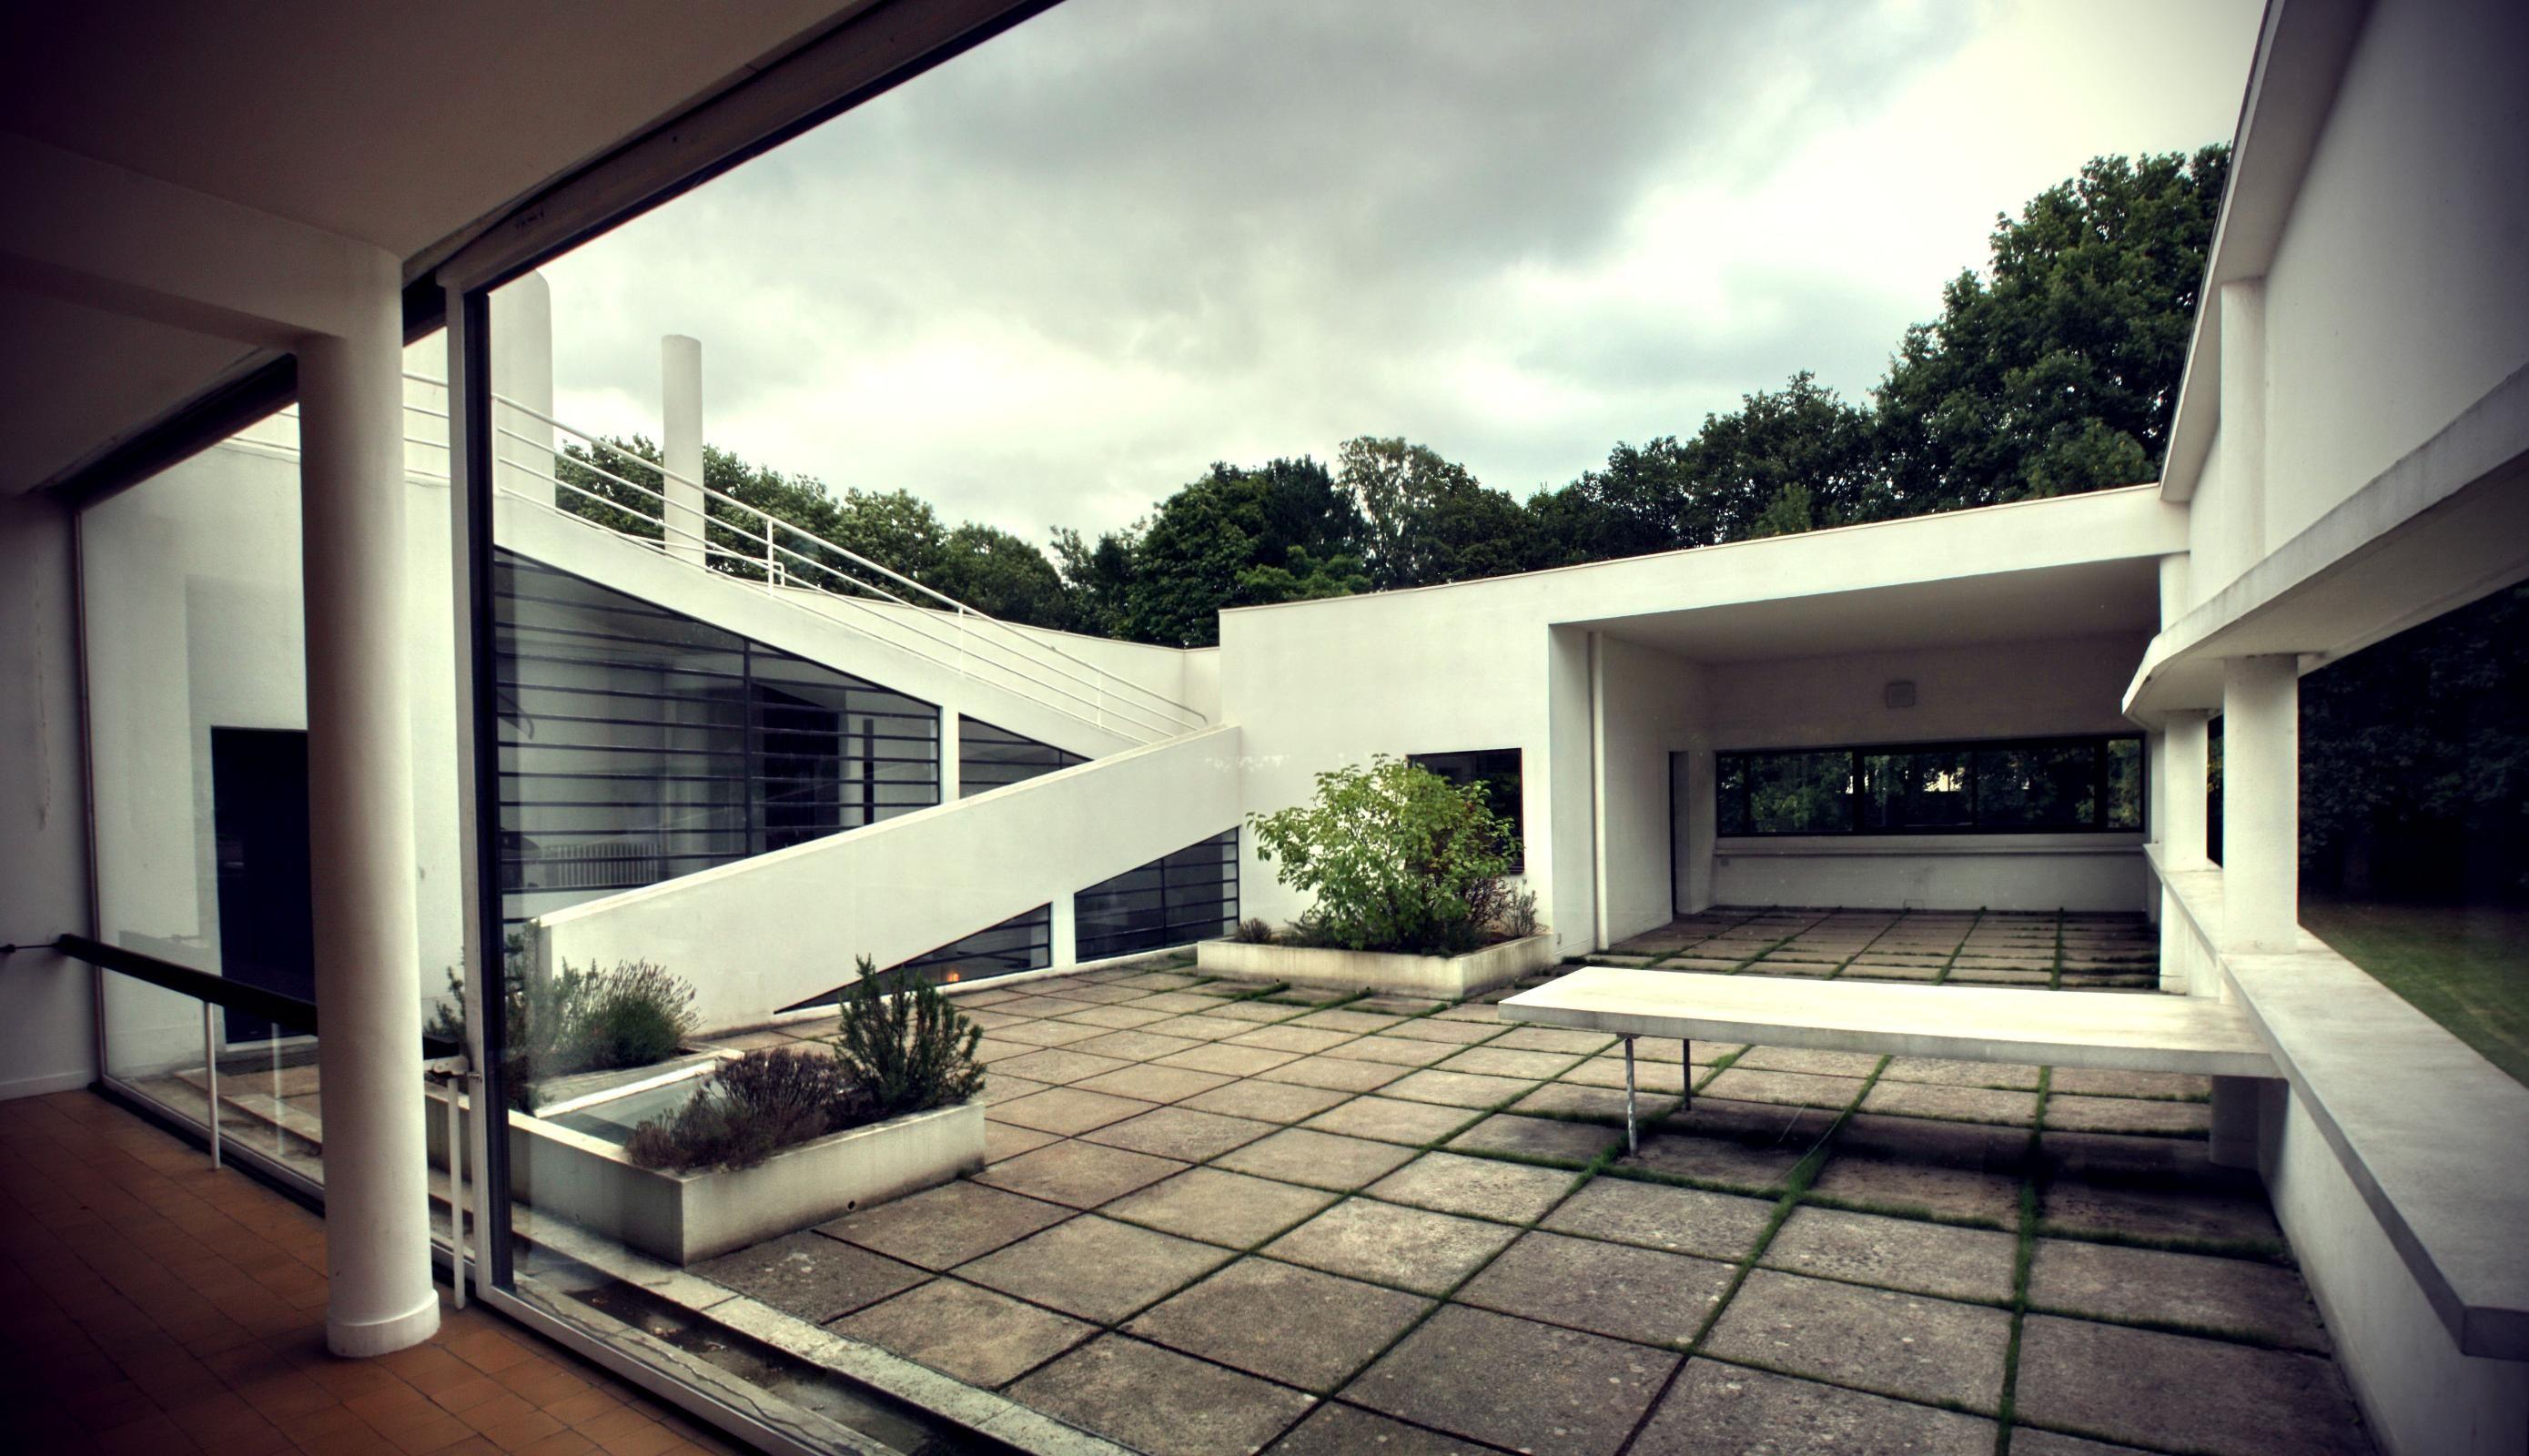 Le corbusier villa savoye interior - Villa Savoye For Tutorial Purposes